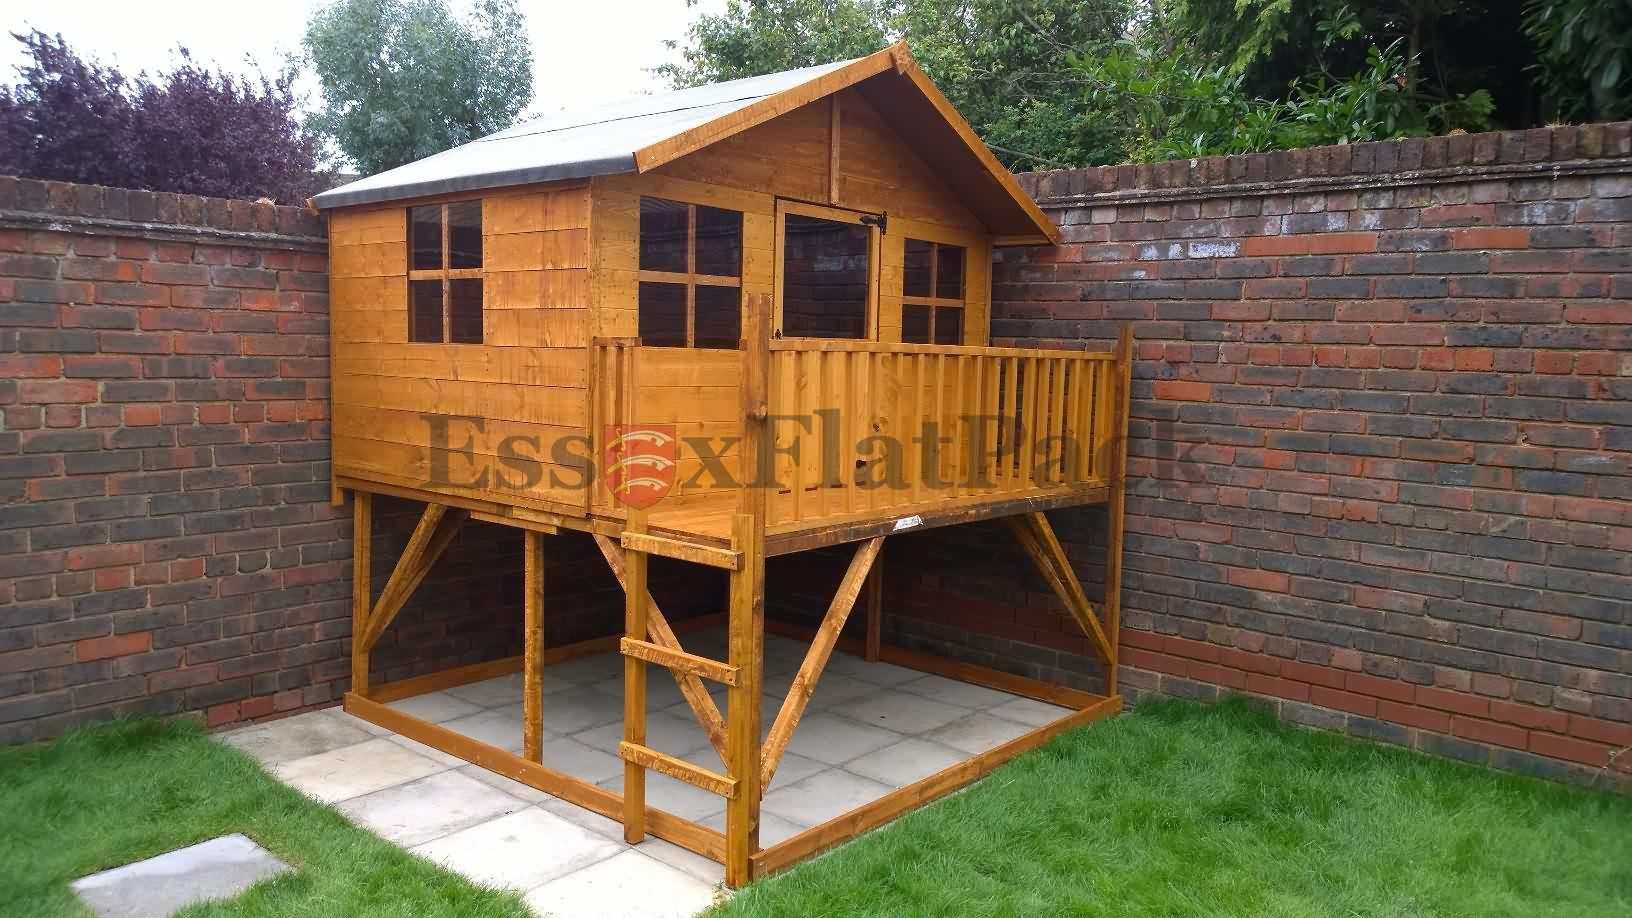 essexflatpack-playhouse-20150727114115.jpg